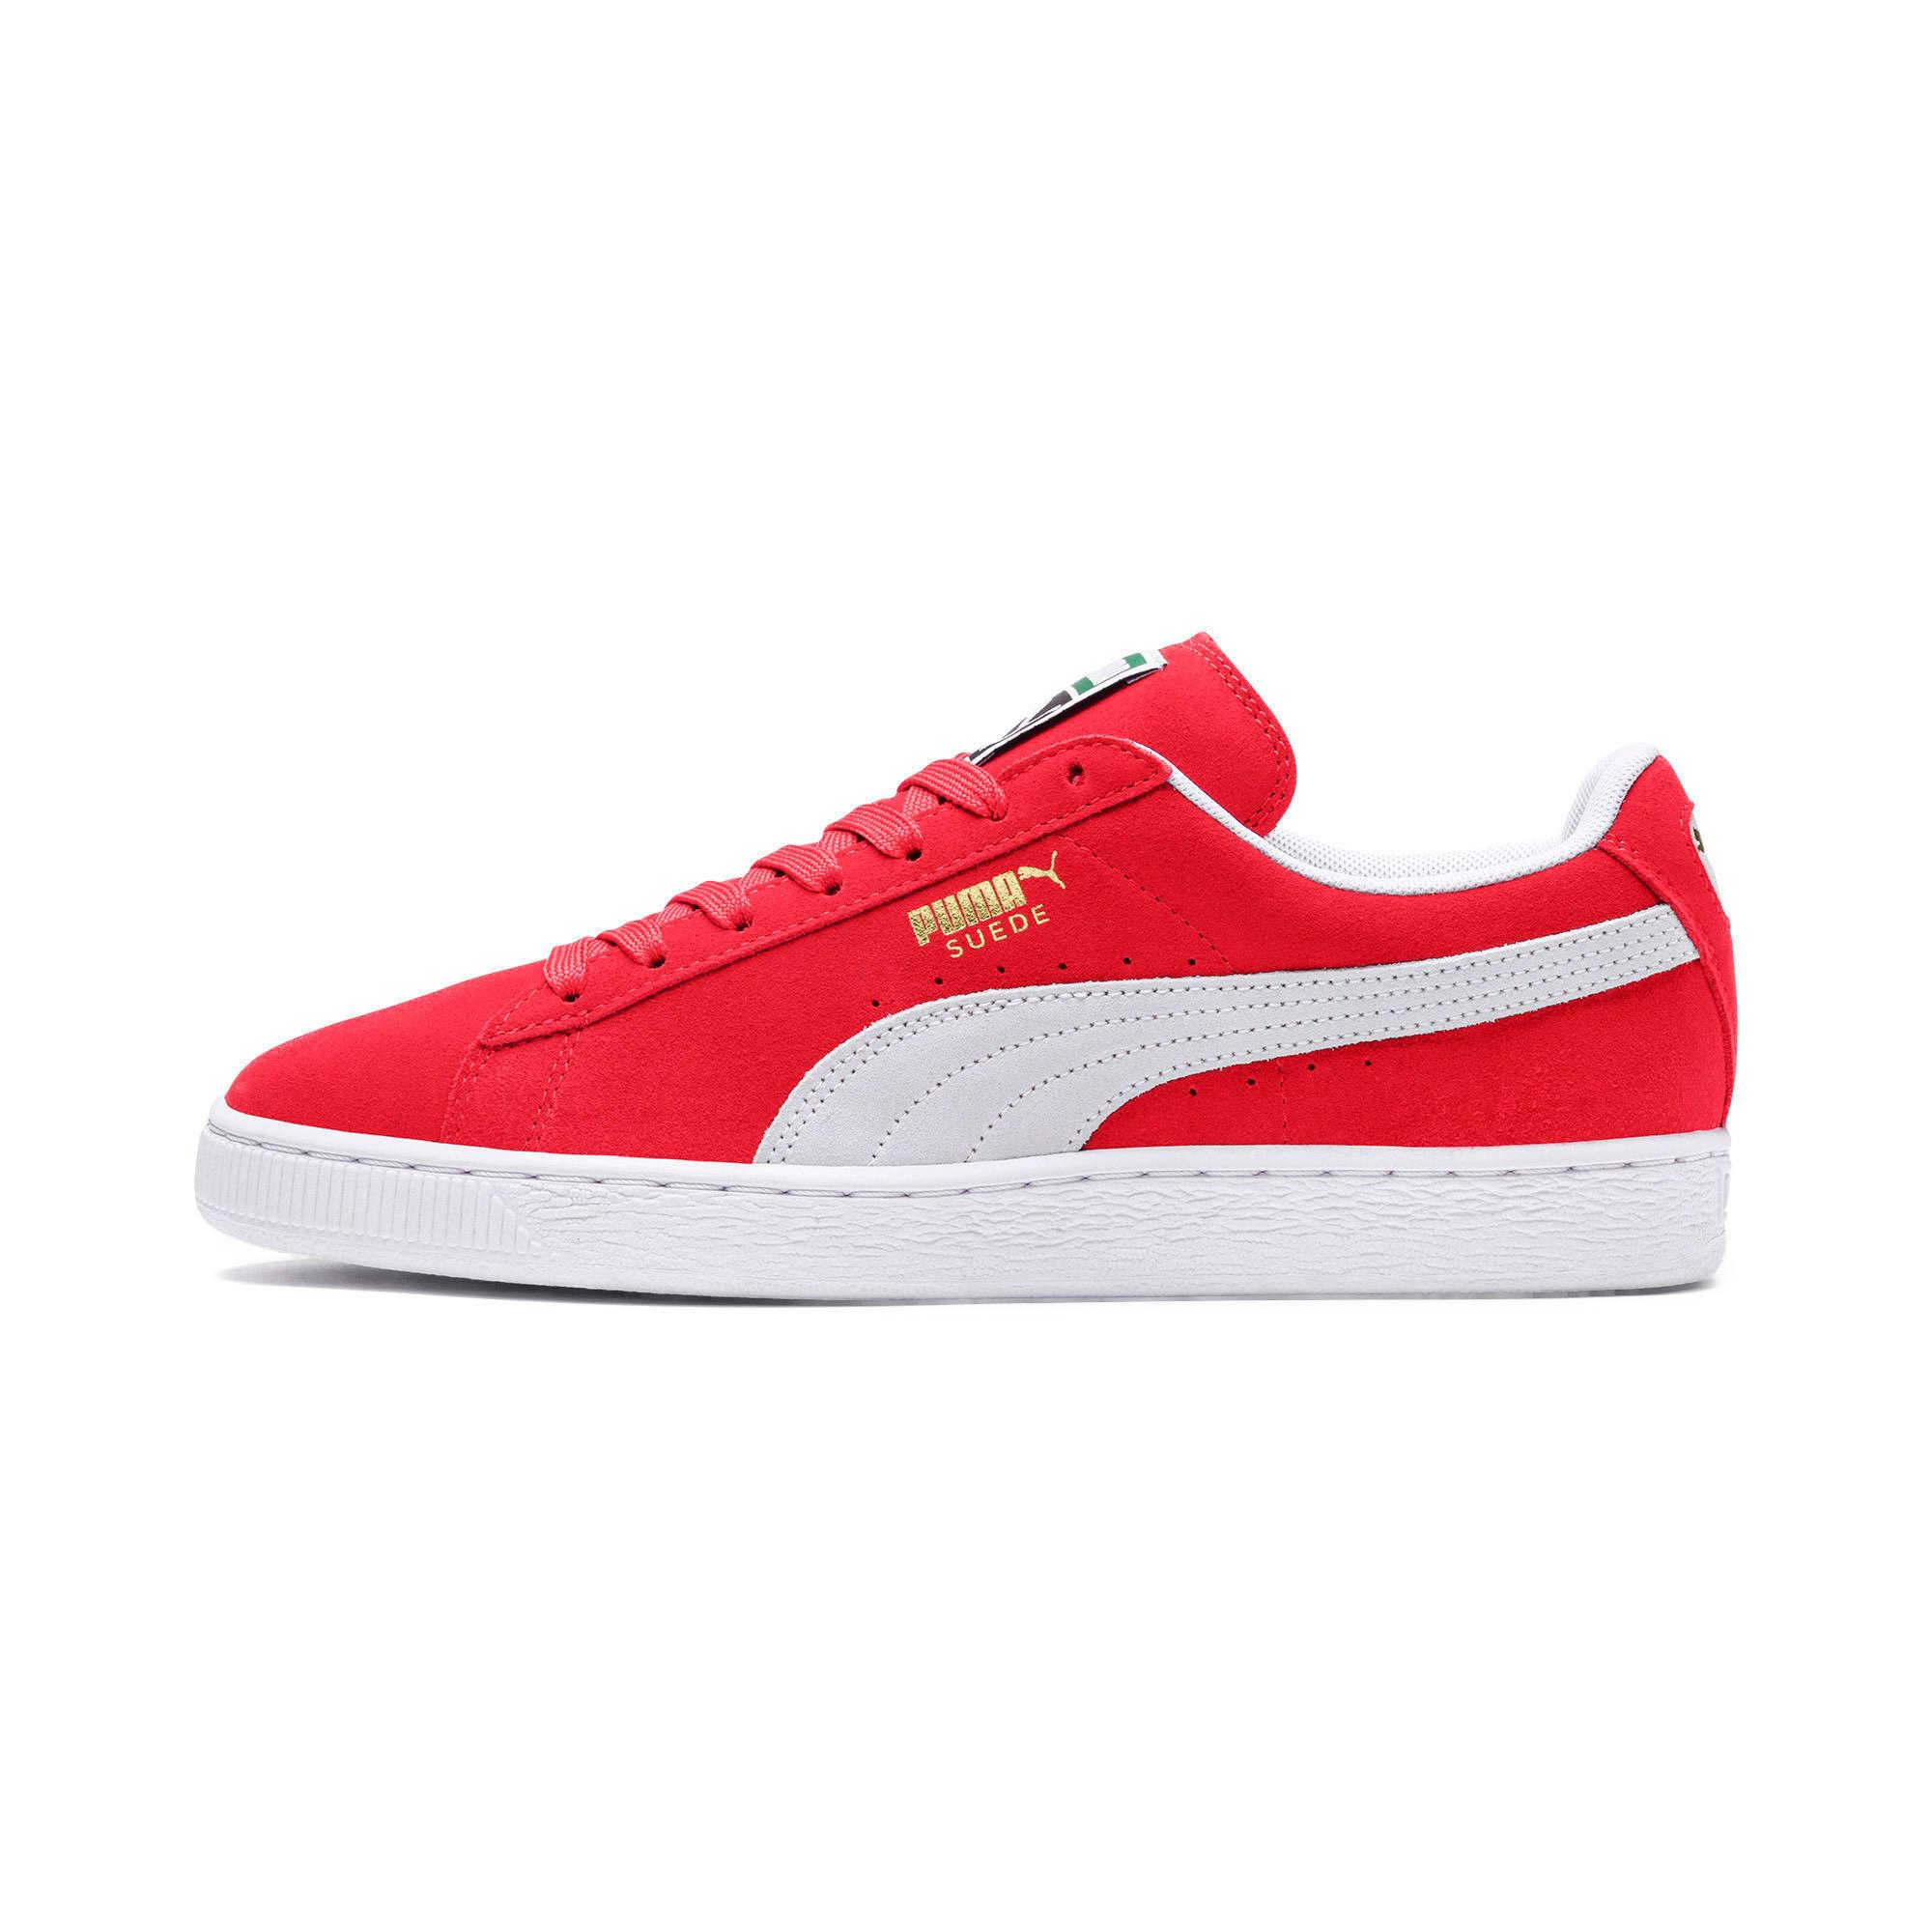 Miniatura 1 de Zapatos deportivos clásicos de gamuza, team regal red-white, mediano